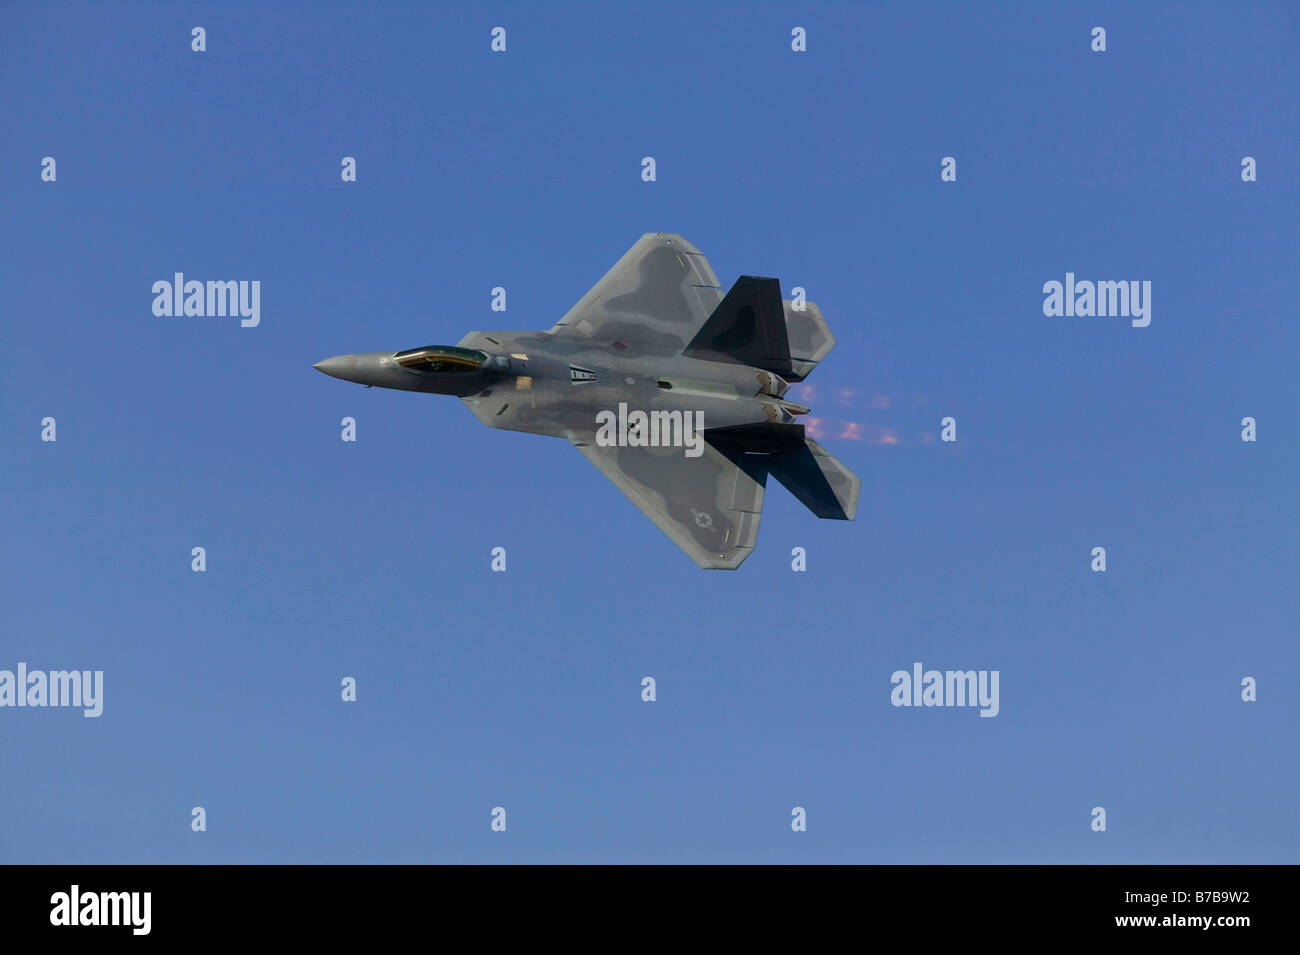 F22 Raptor USAF fighter at speed - Stock Image